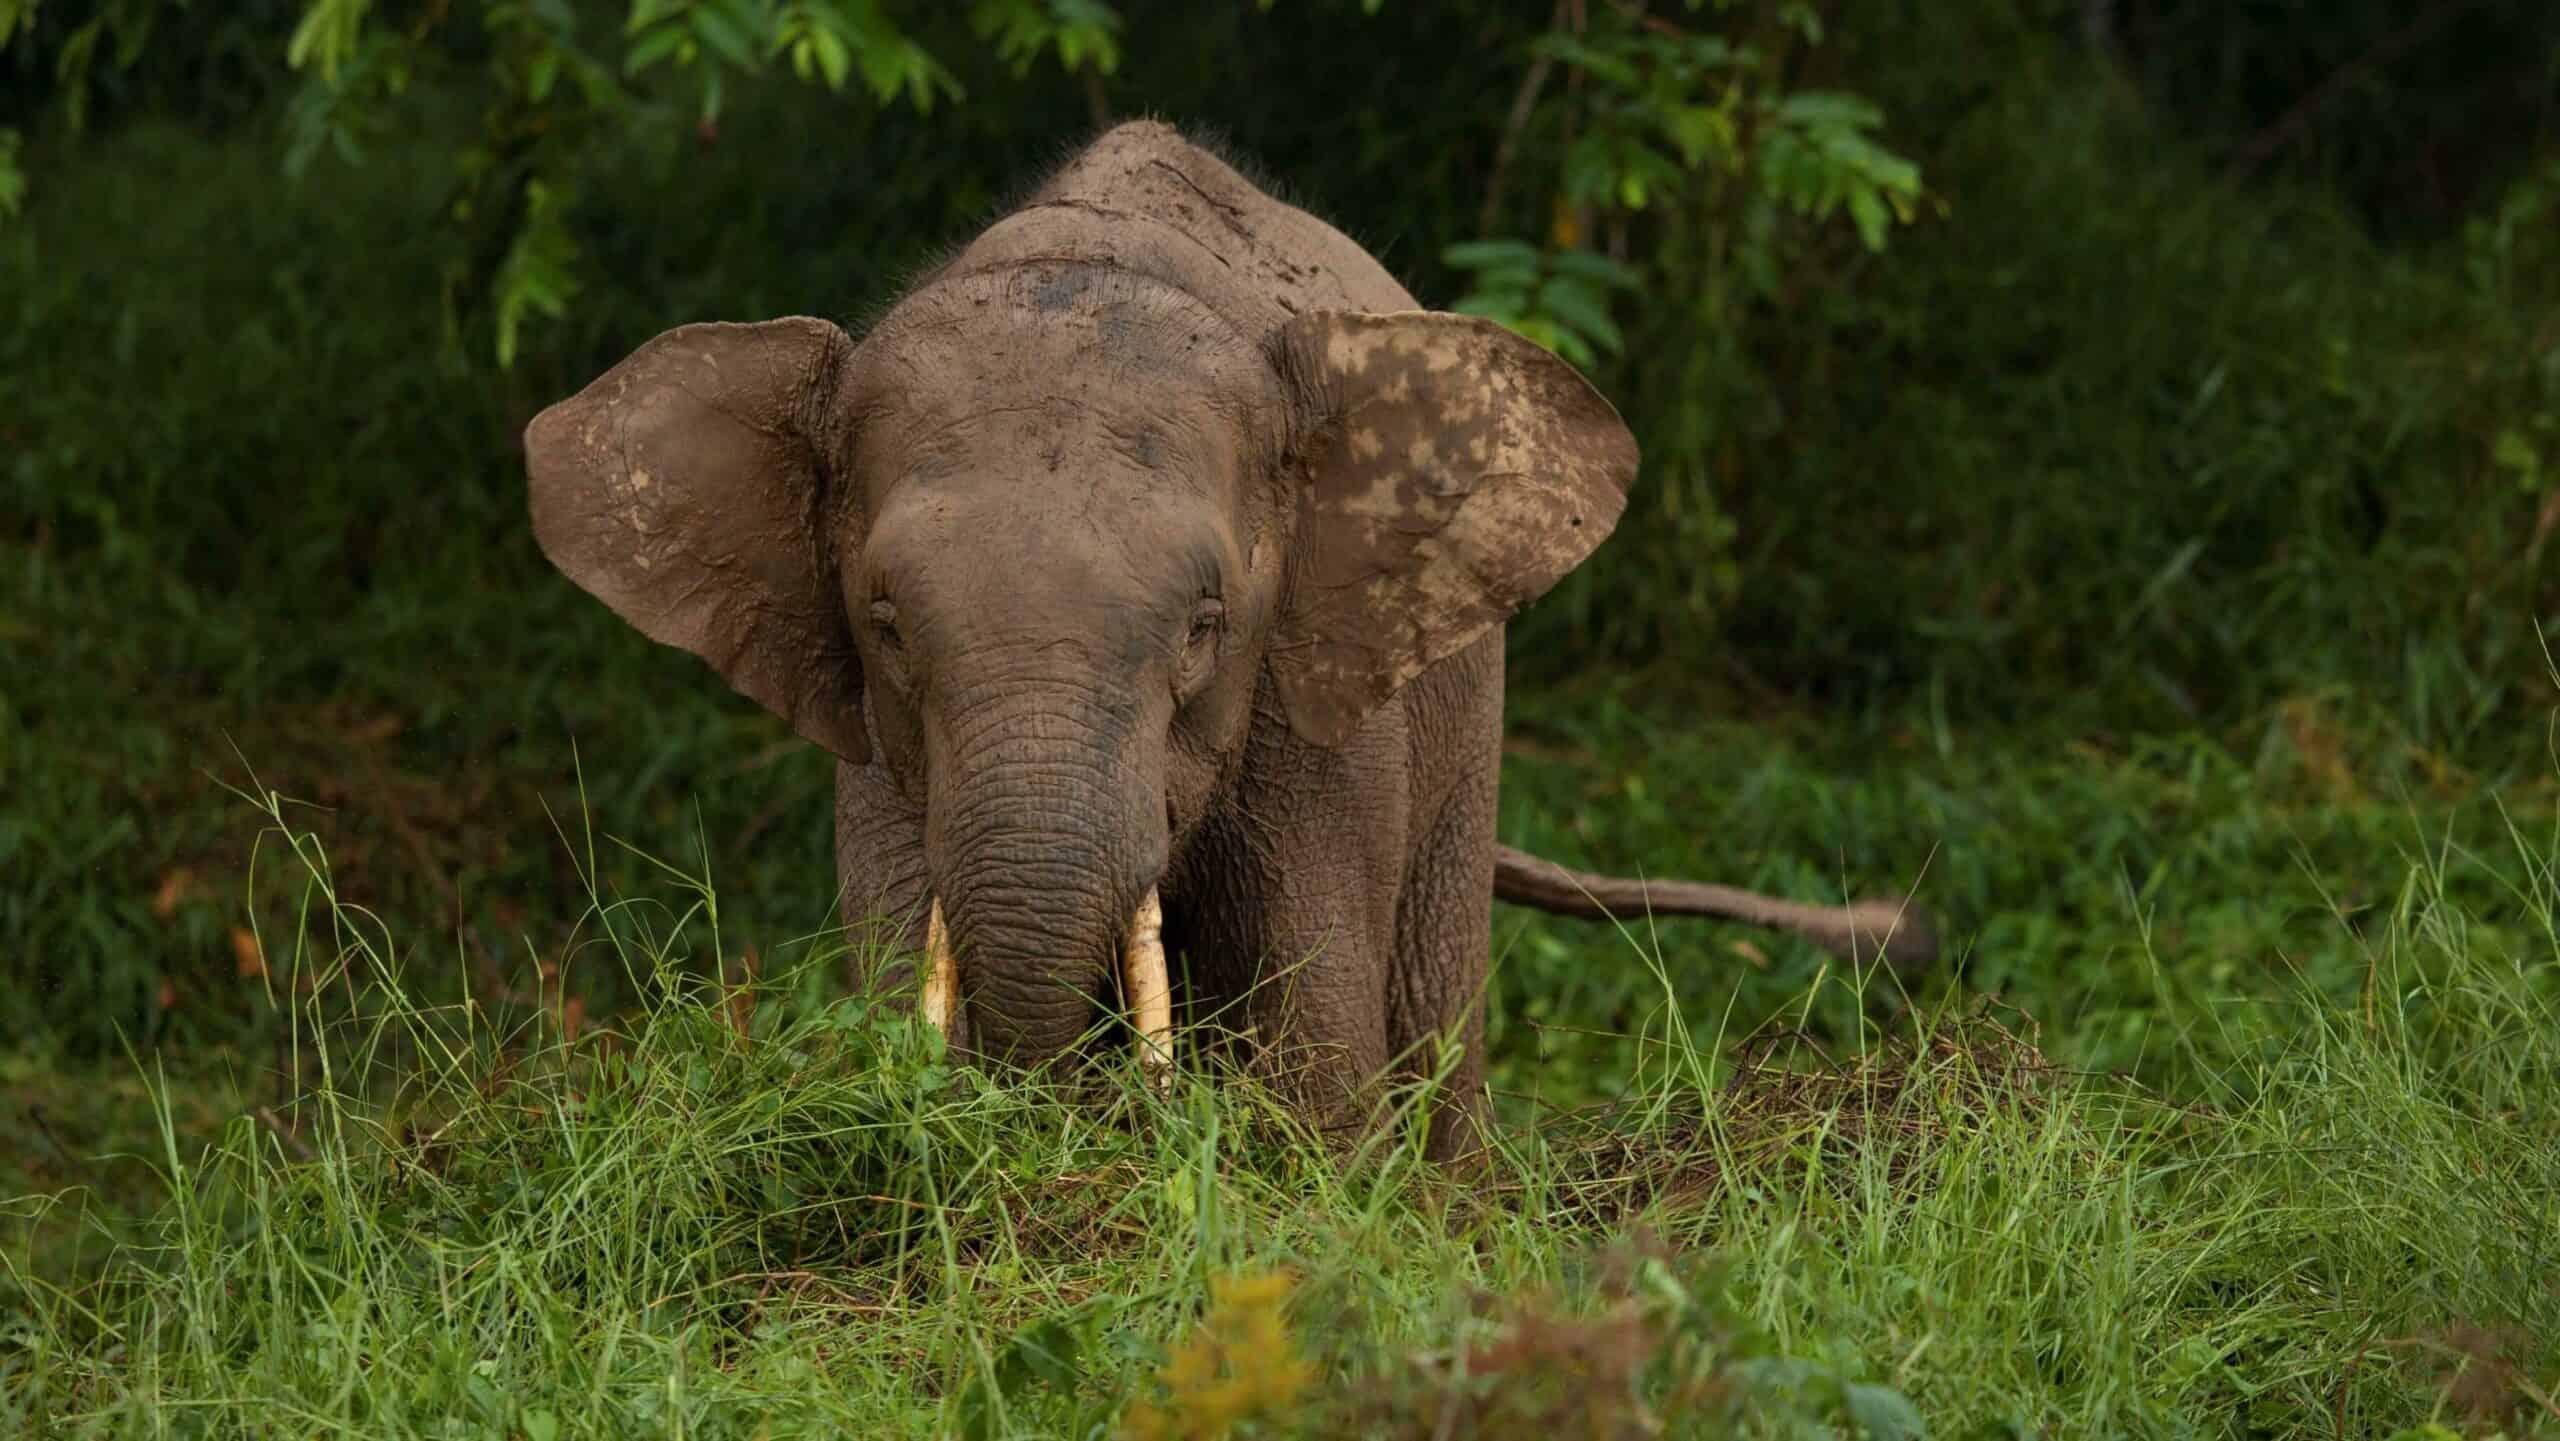 A Borneo pygmy elephant. © Charles Ryan